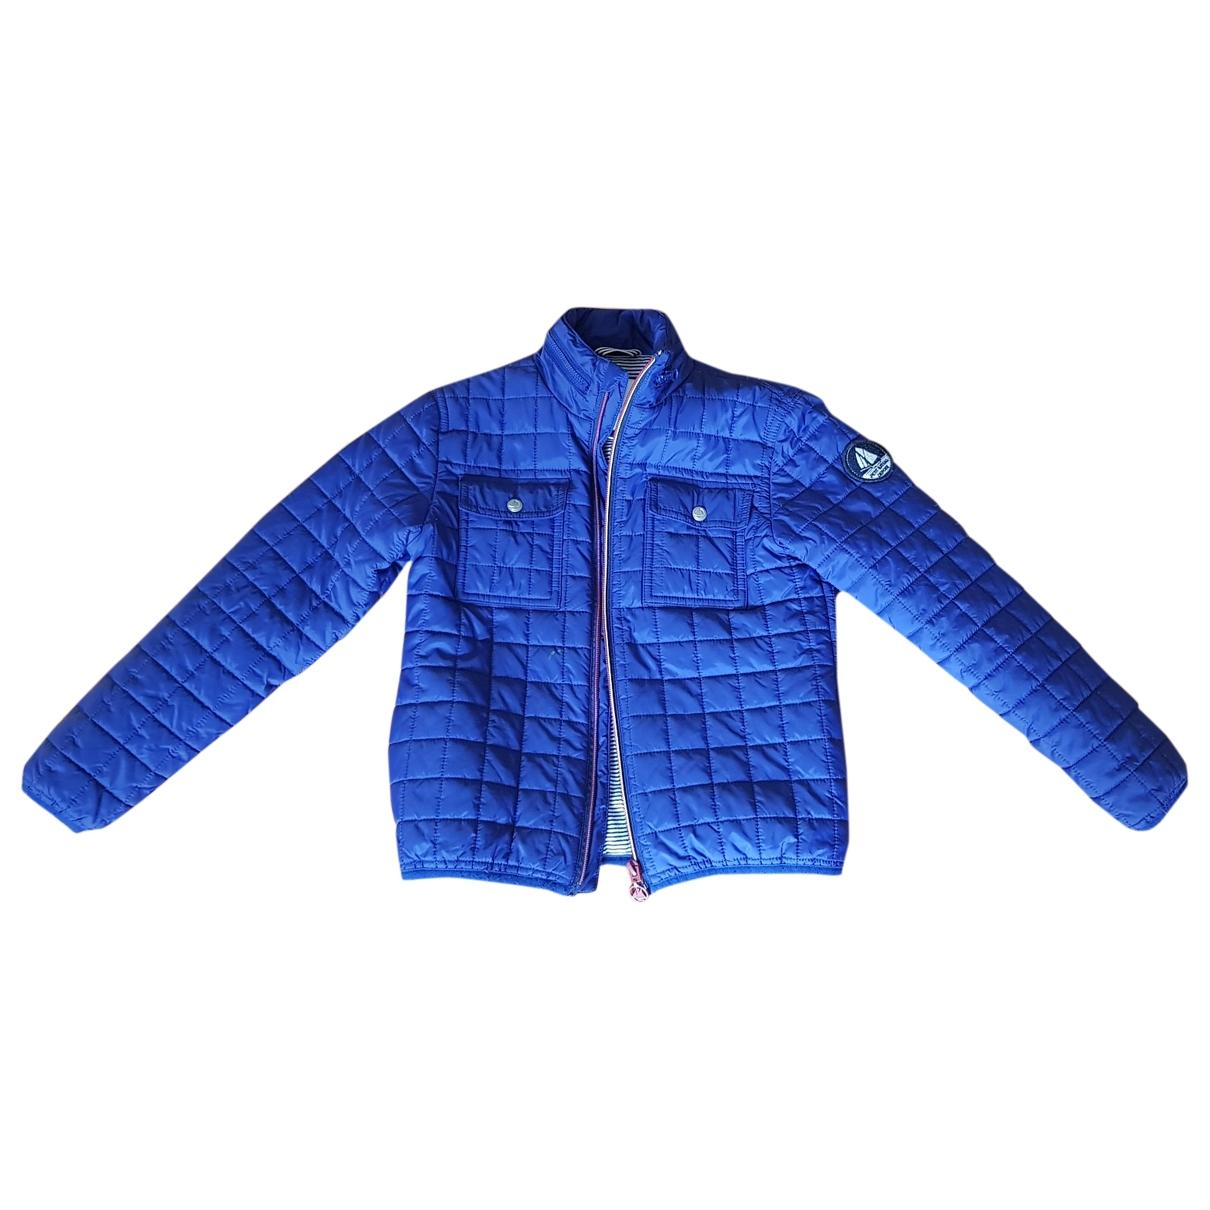 Petit Bateau \N Blue jacket & coat for Kids 8 years - up to 128cm FR